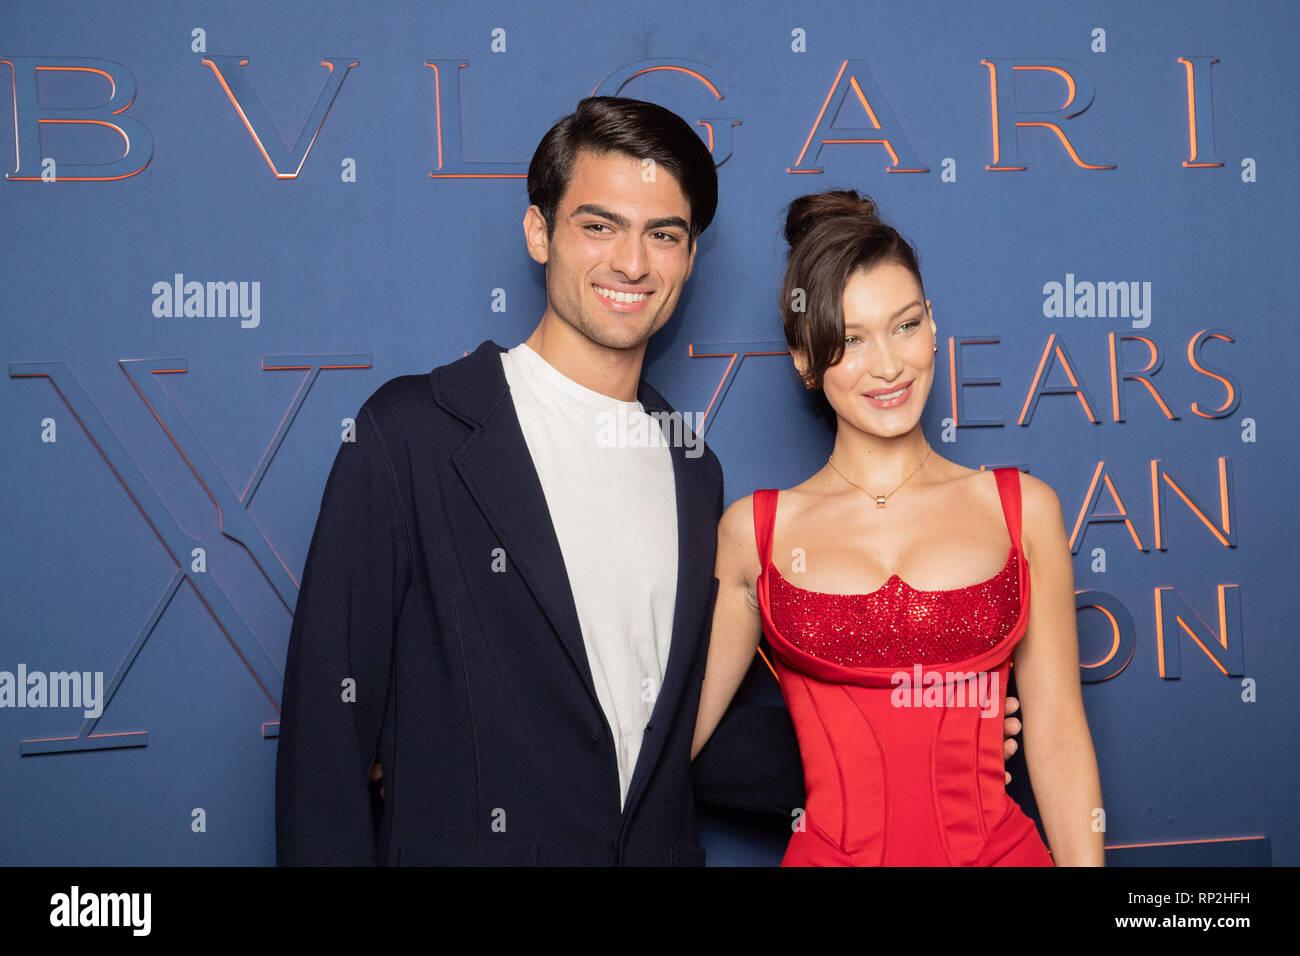 * NO WEB * NO DAILY NEWS * Rome, Bulgari party for the 20th anniversary In the picture: Matteo Bocelli, Bella Hadid - Stock Image